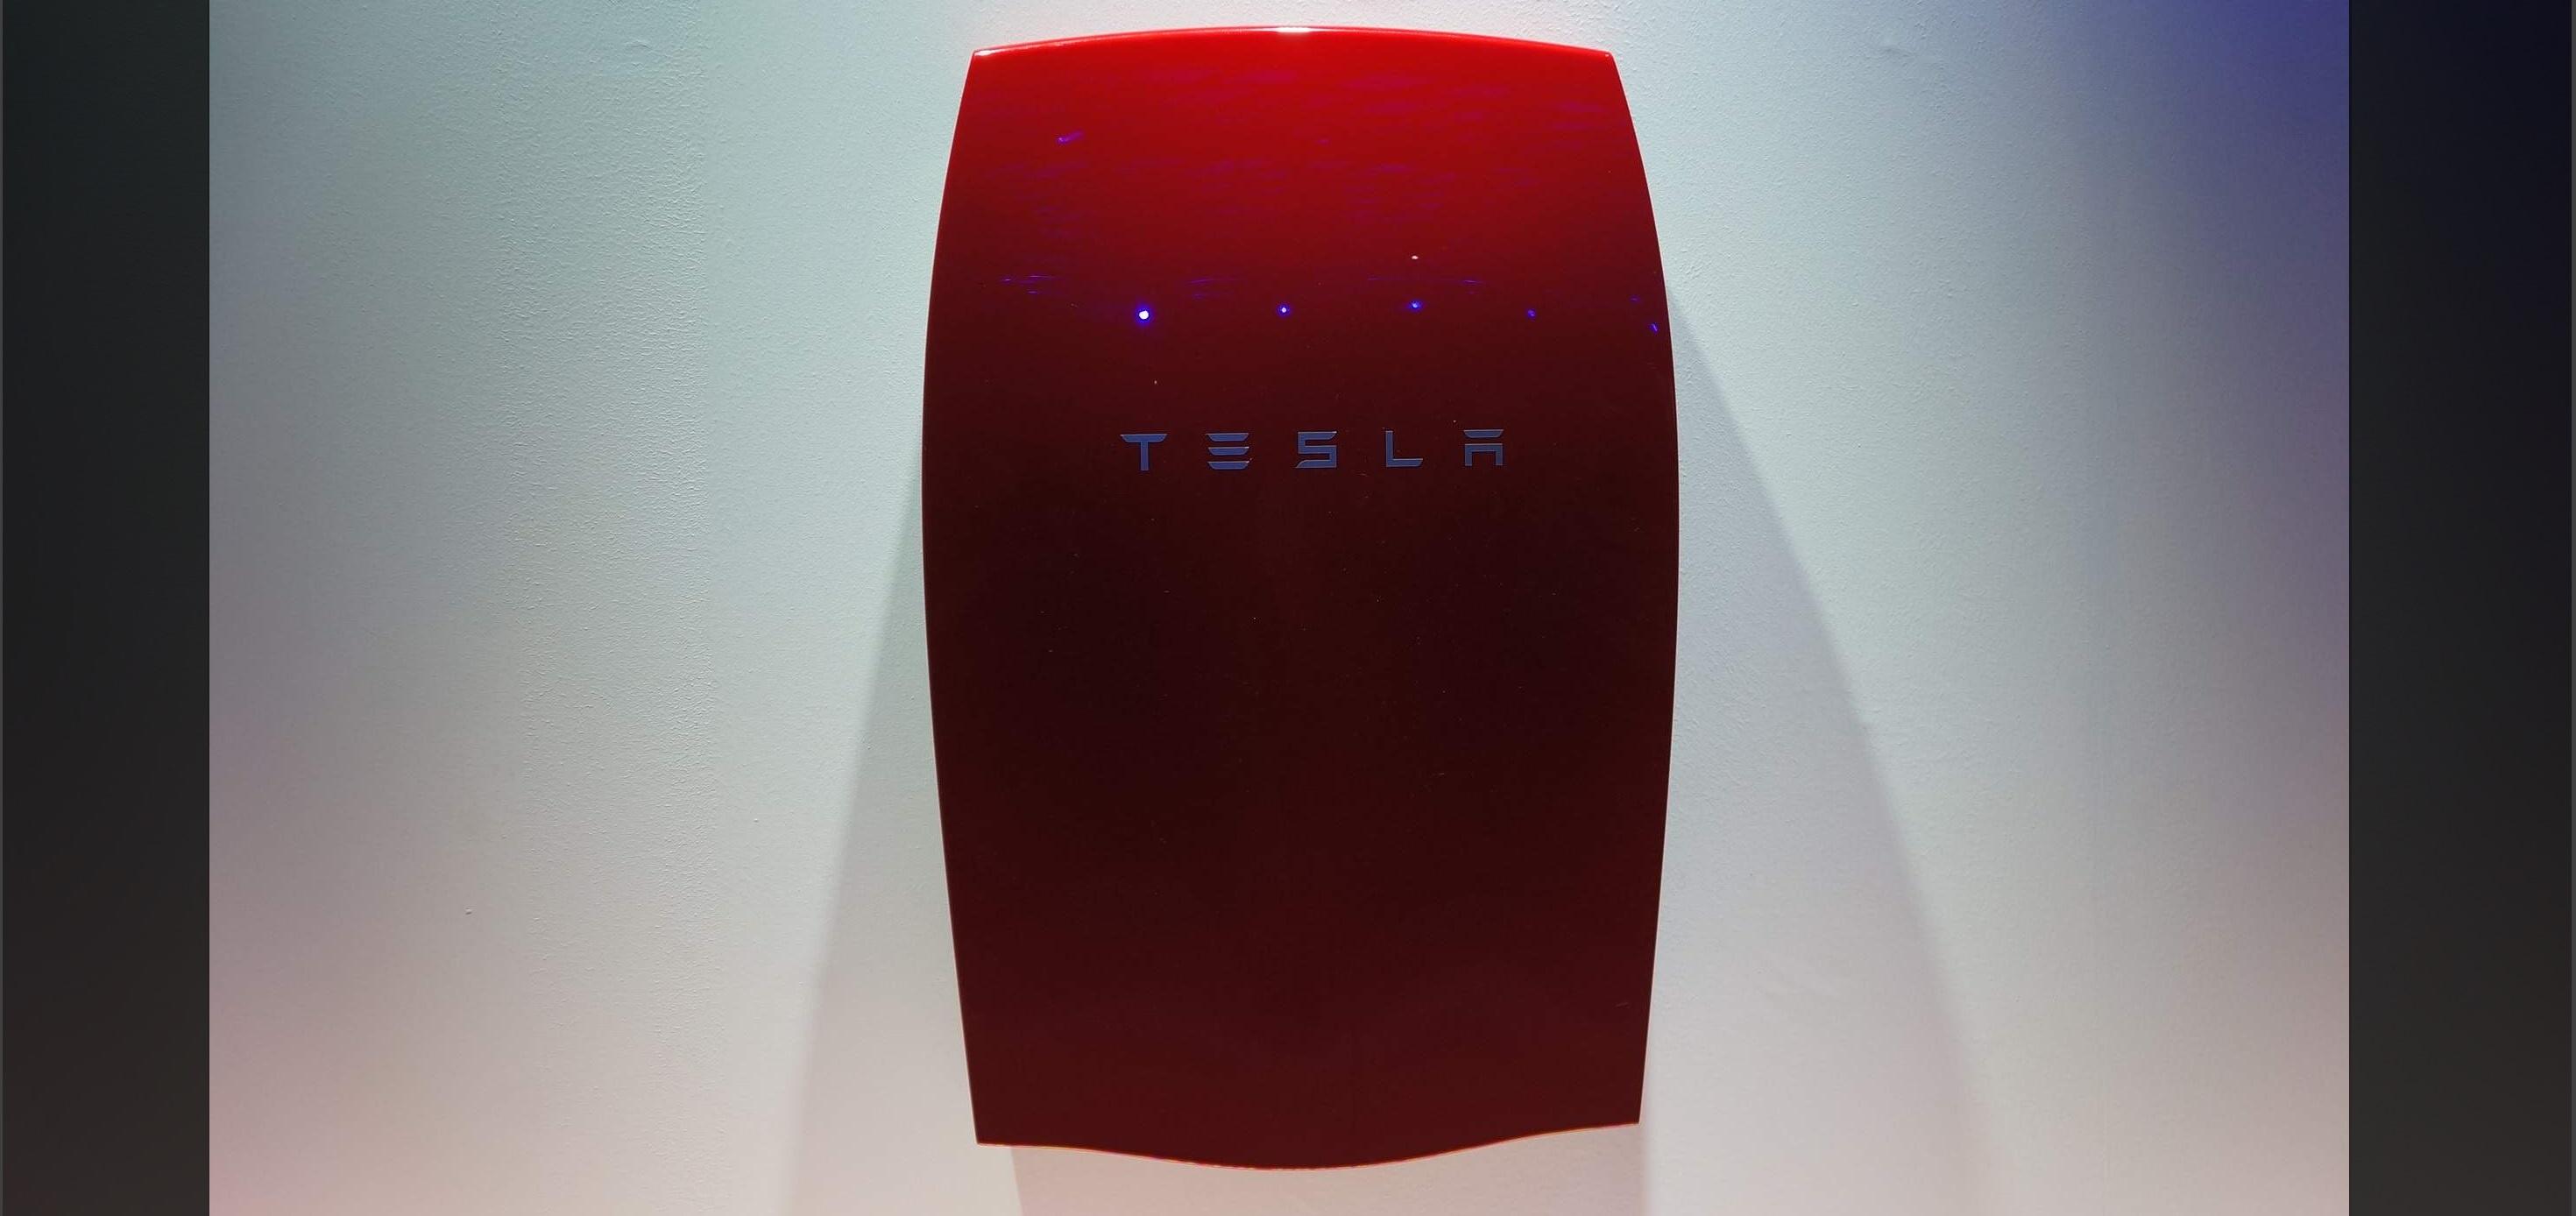 powerwall-red-2